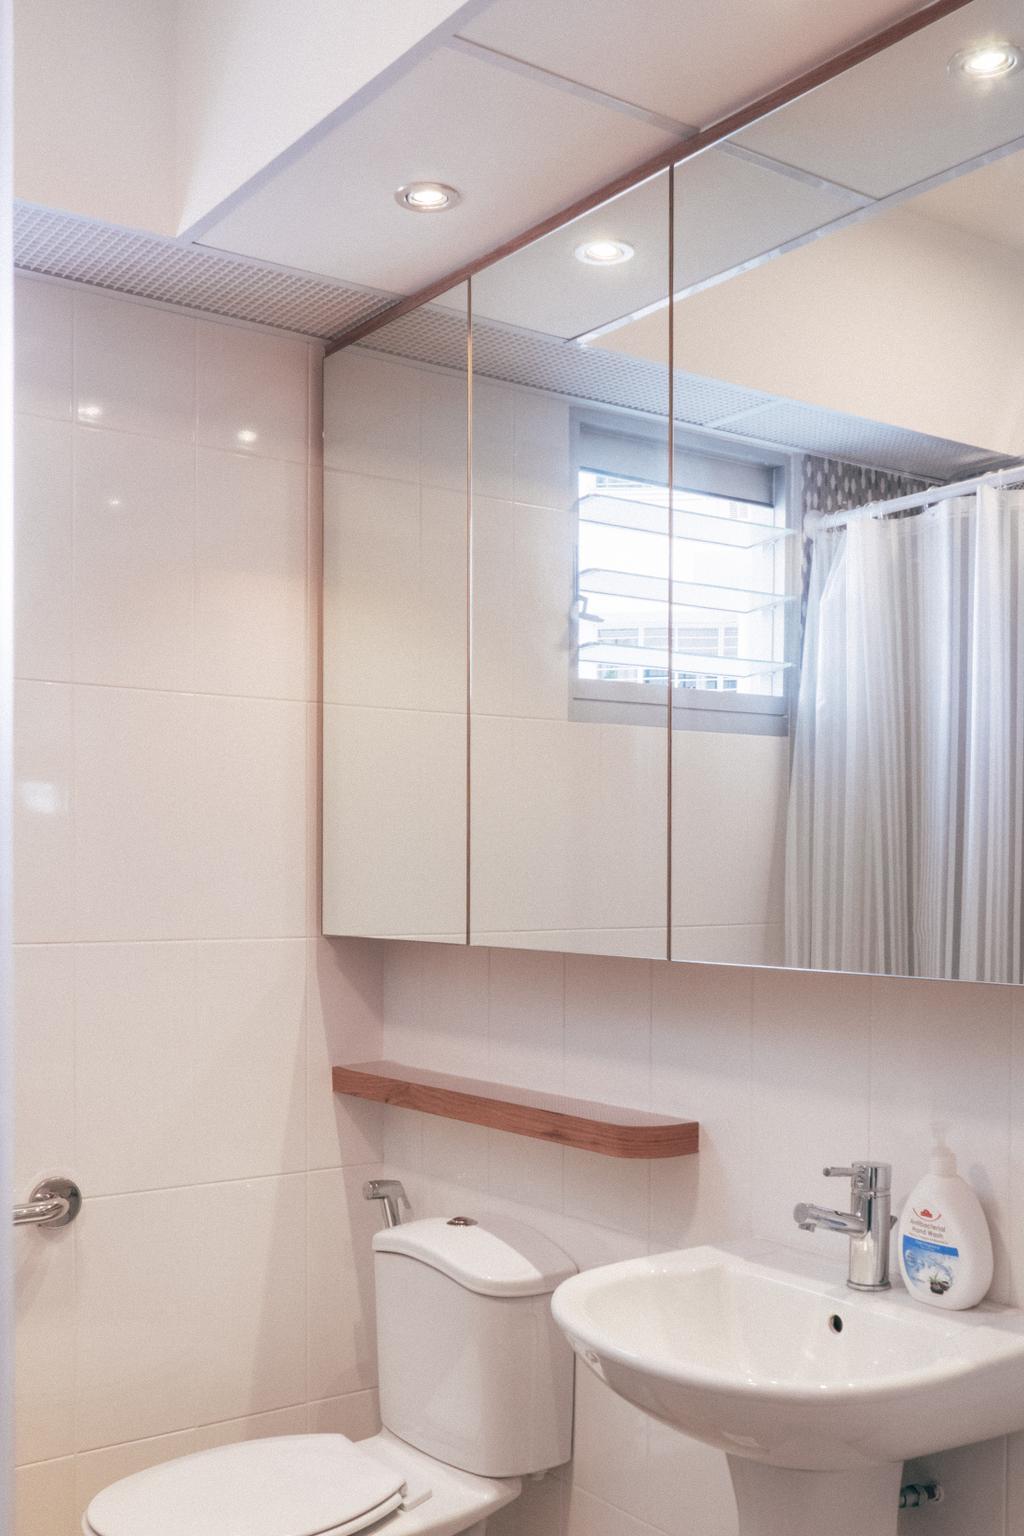 Scandinavian, HDB, Bathroom, Chai Chee (Block 808C), Interior Designer, Urban Habitat Design, White Bathroom, , Water Closet, Toilet Bowl, Pedestal Sink, Bathroom Sink, Mirror, Bathroom Cabinet, Light Colours